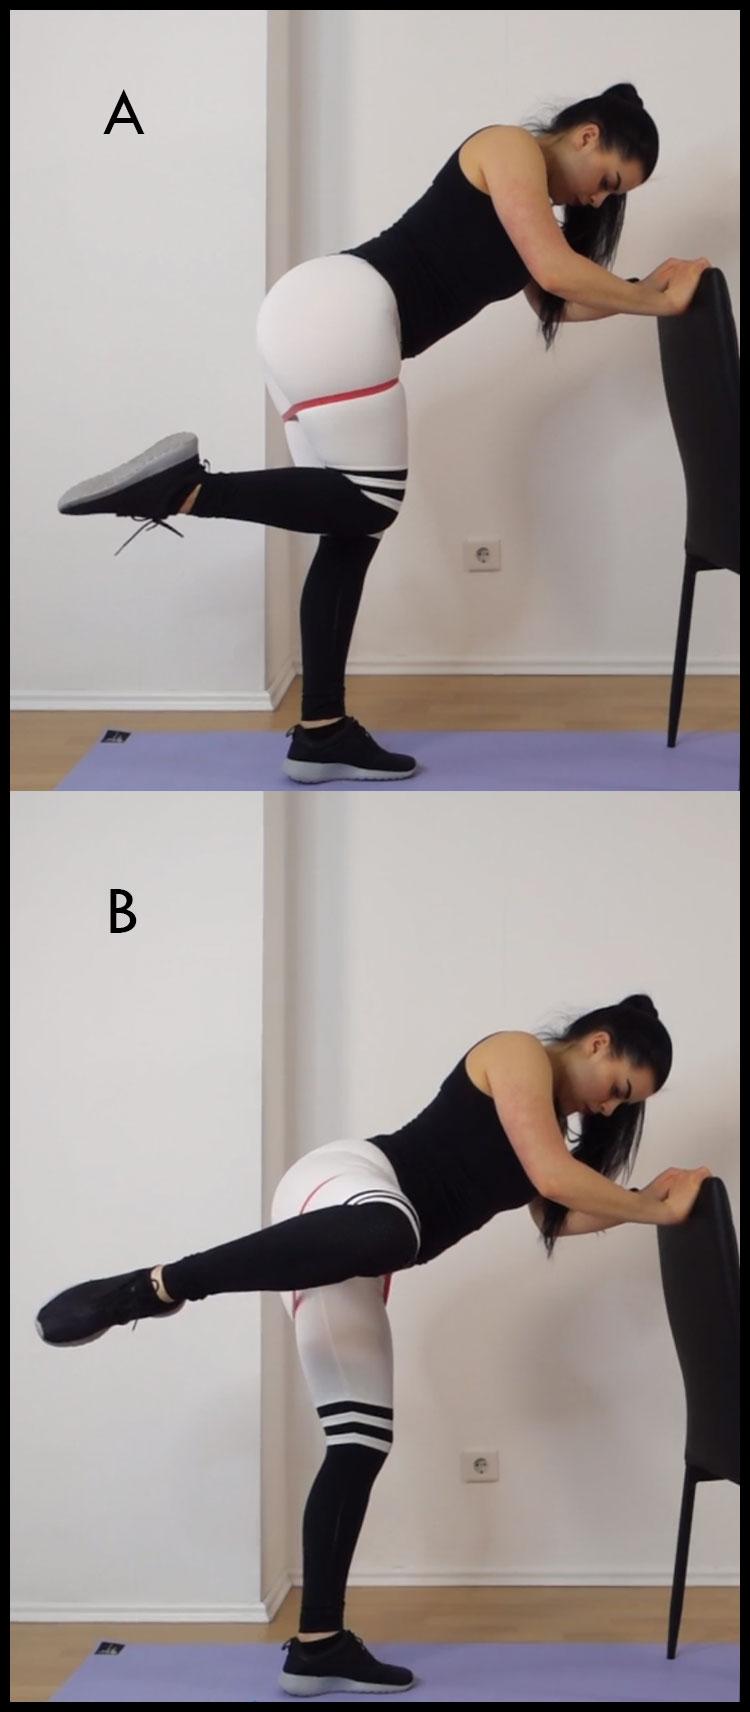 glute medius workout